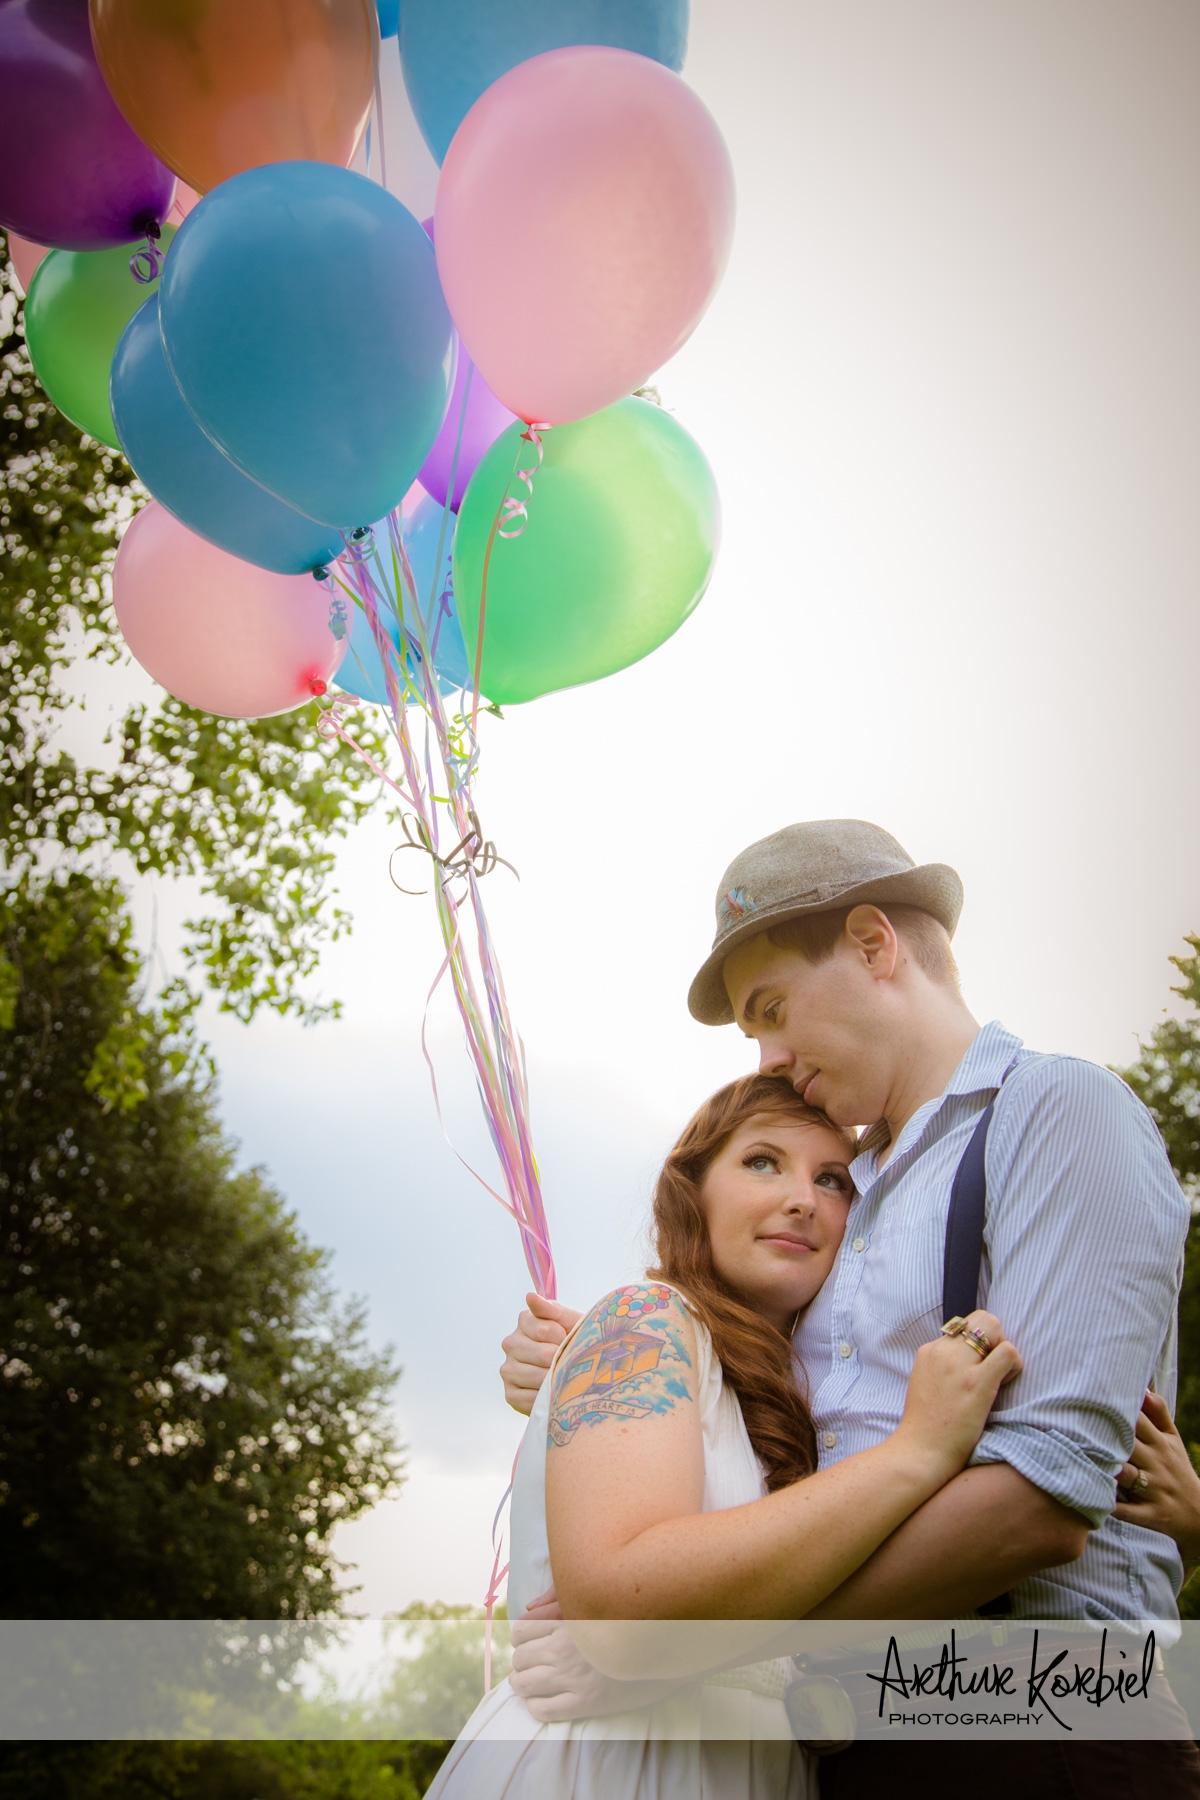 Arthur Korbiel Photography - London Engagement Photographer - Erin &Cameron-020.jpg